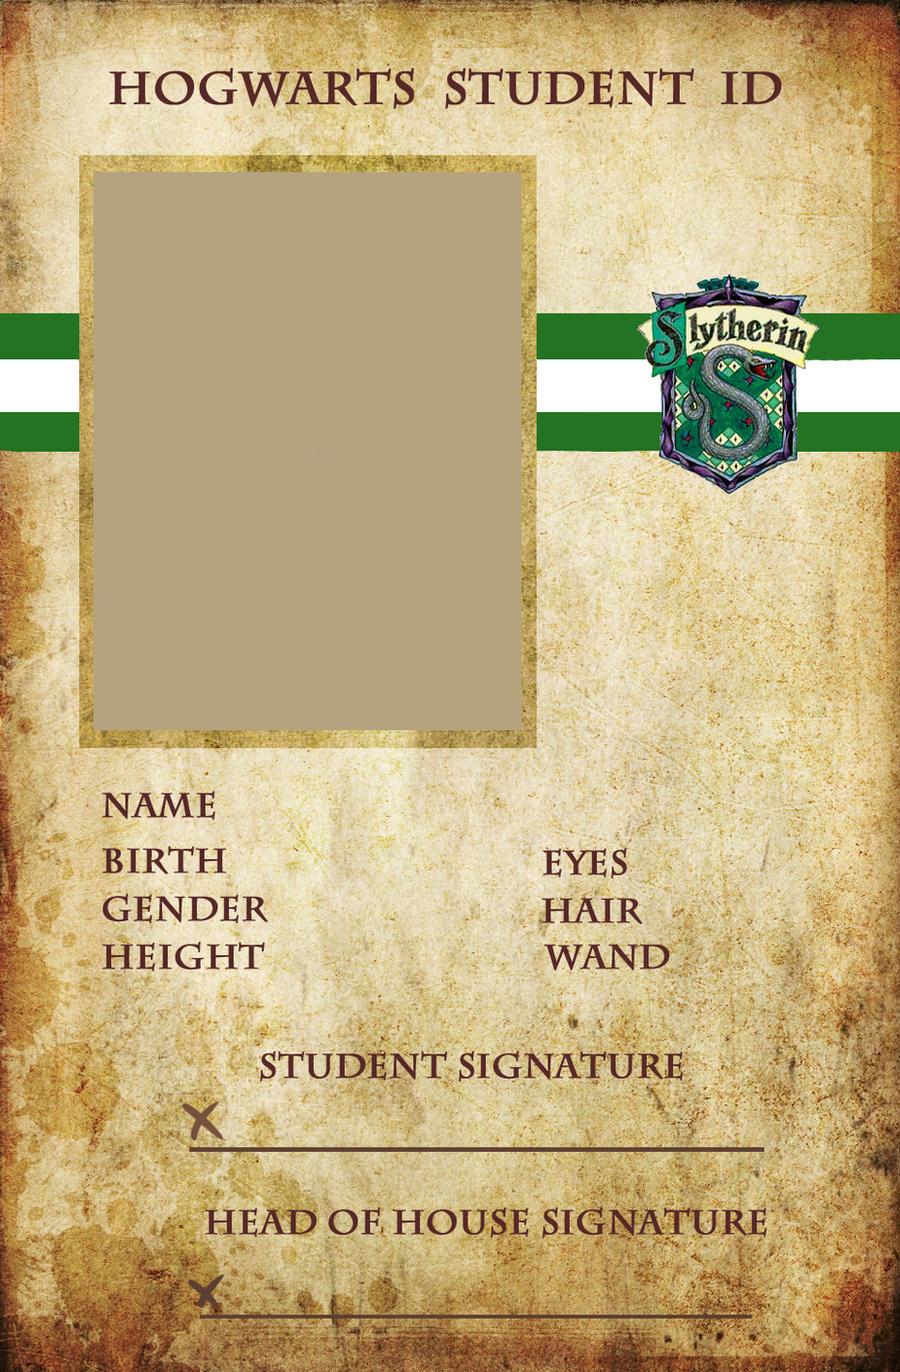 Slytherin ID